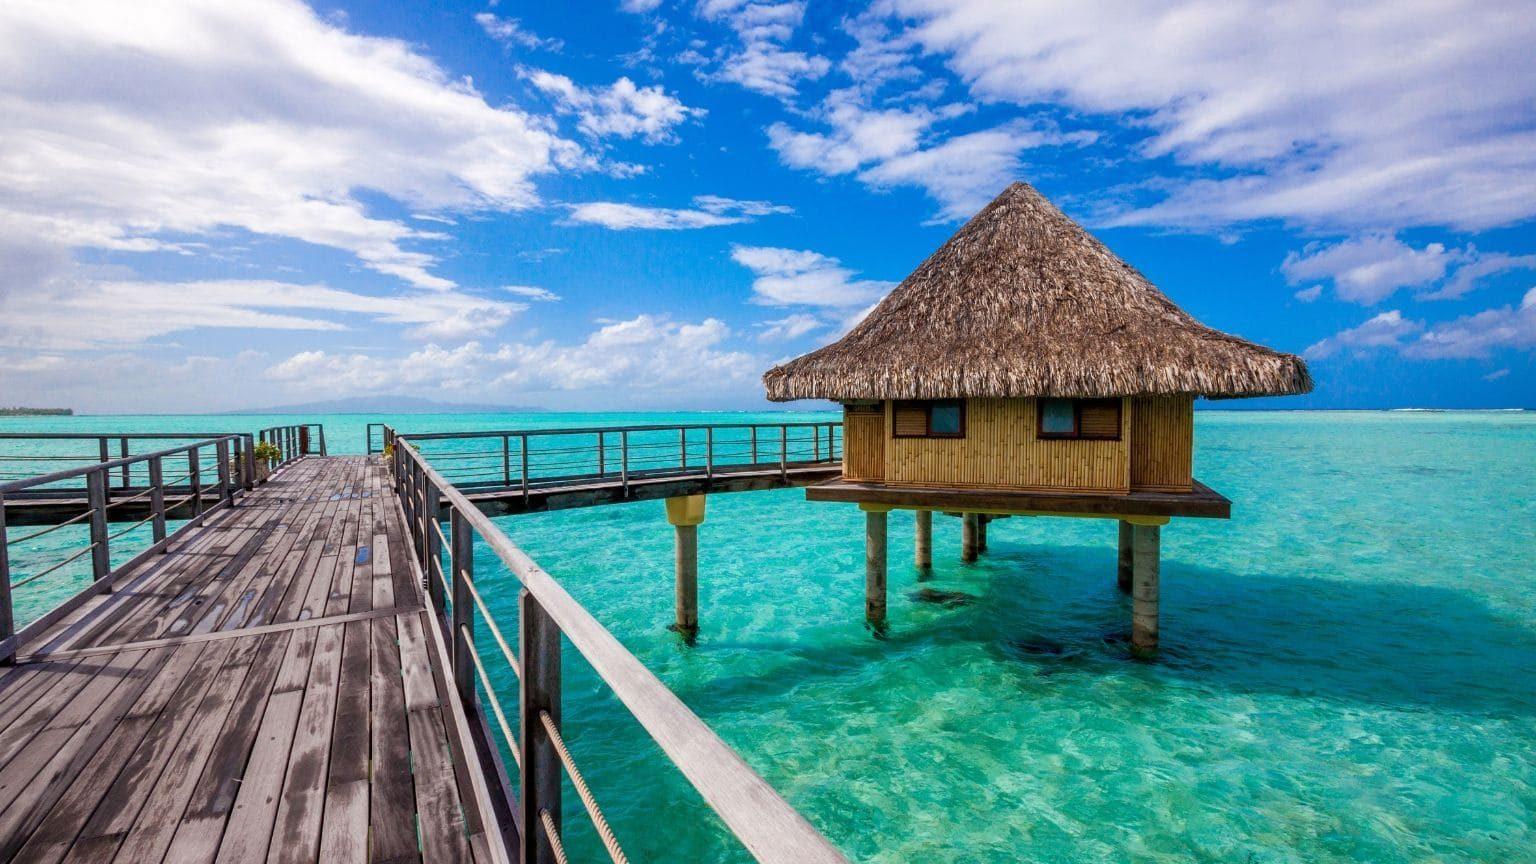 Nipa hut by the beach, French Polynesia